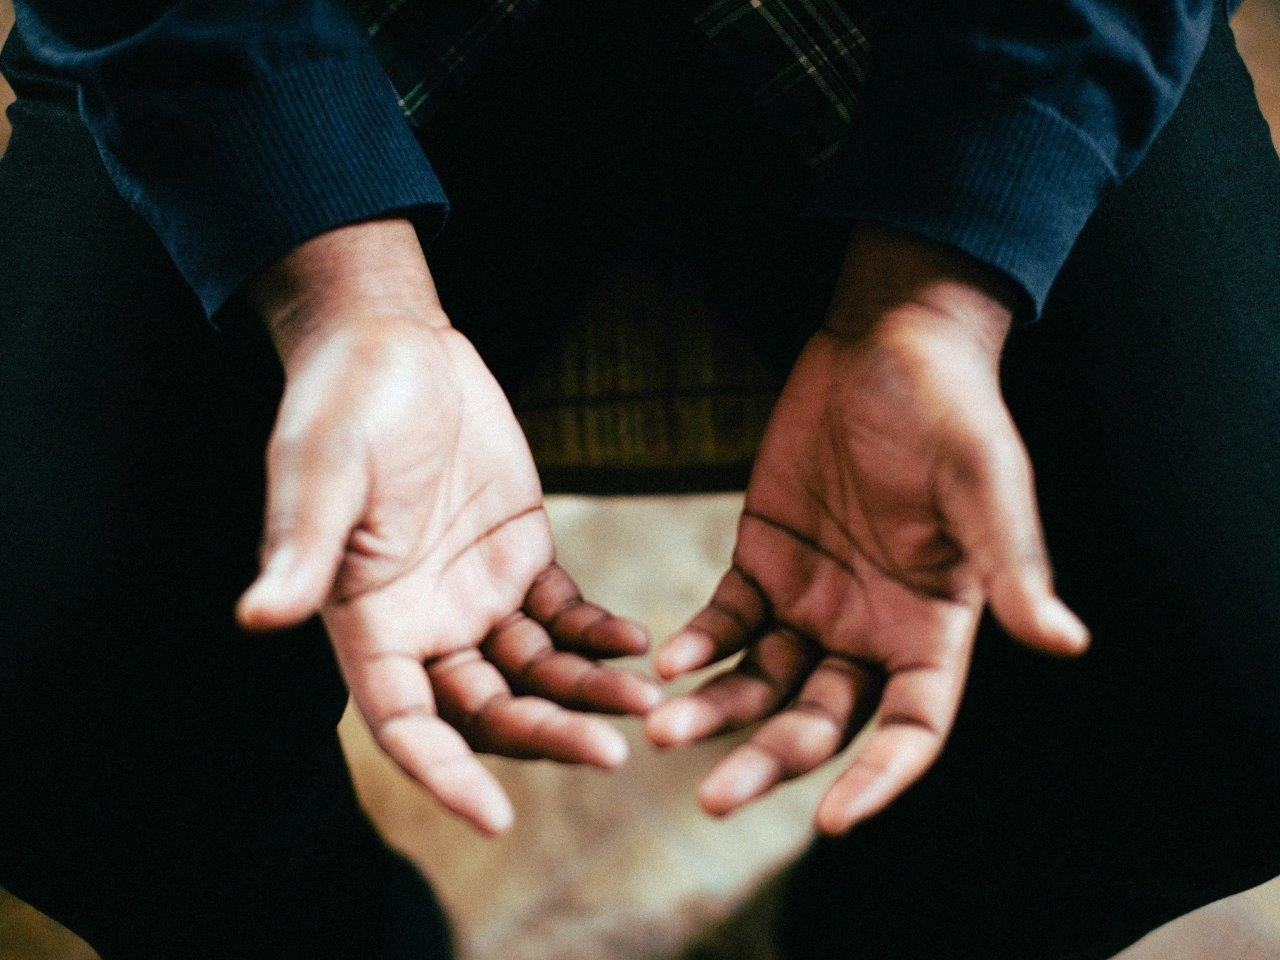 Prayer Circle Wednesdays 5:30 Pm To 6:00 Pm – On Zoom